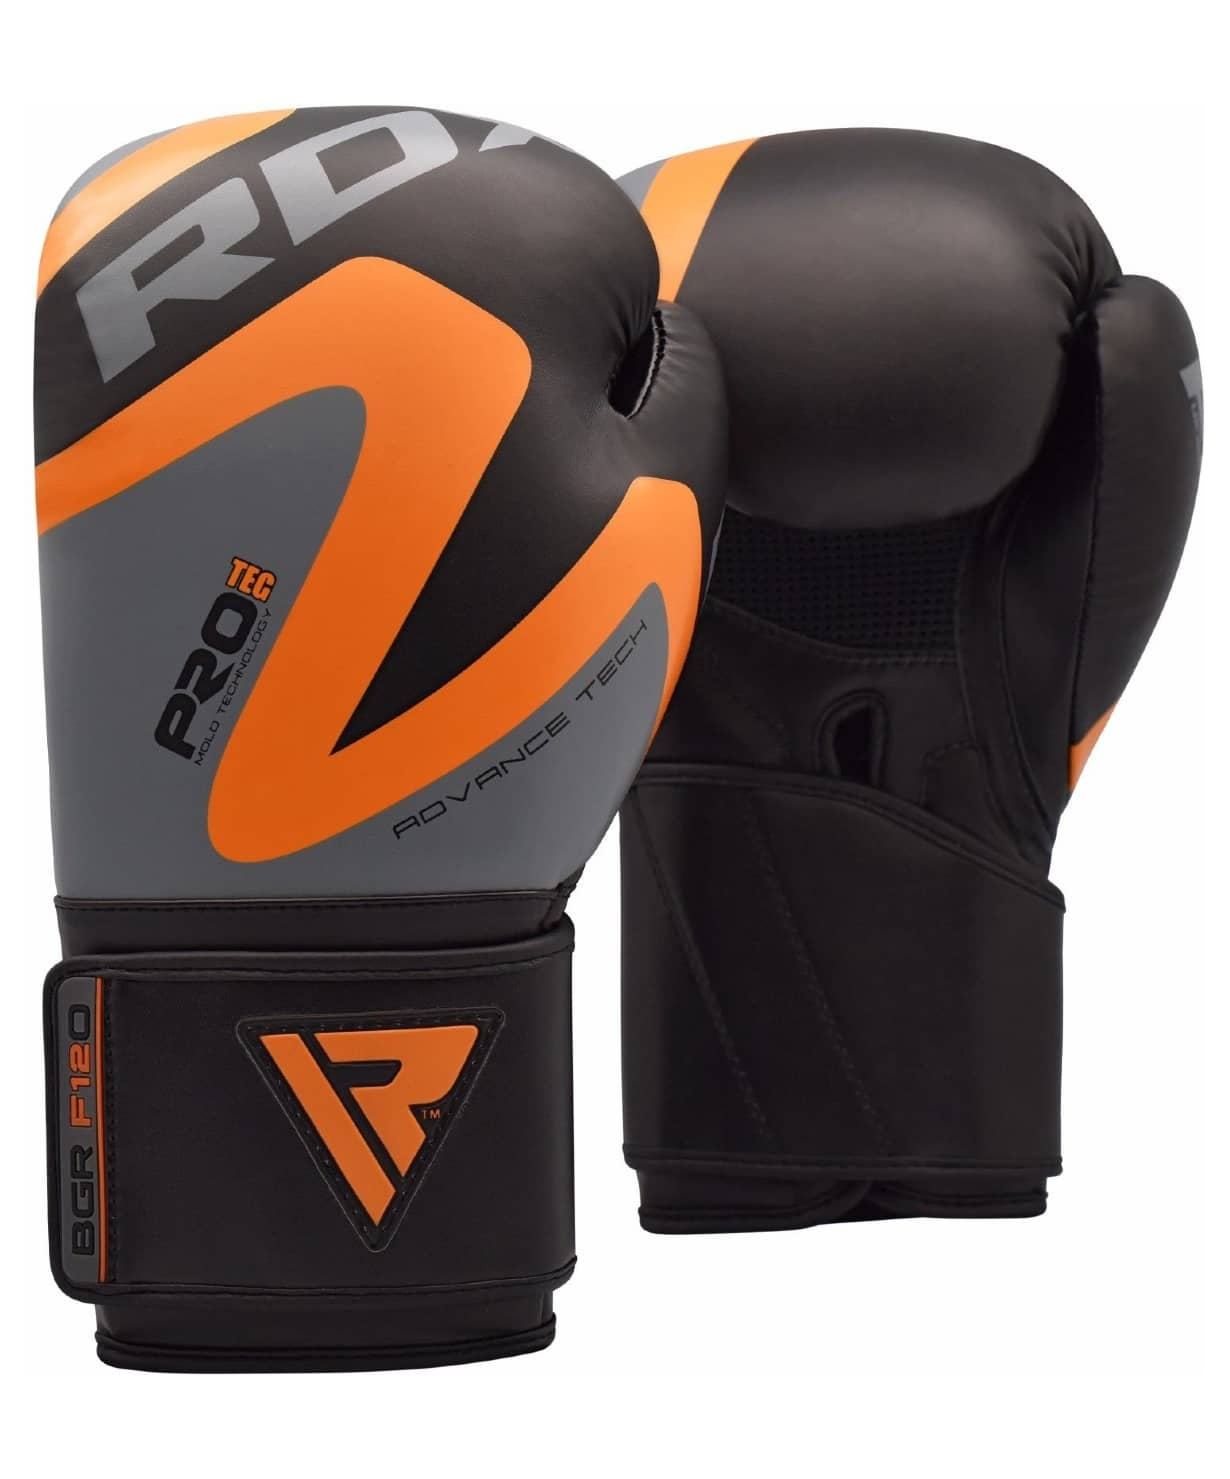 Перчатки боксерские REX F12 ORANGE BGR-F12O, 12 oz